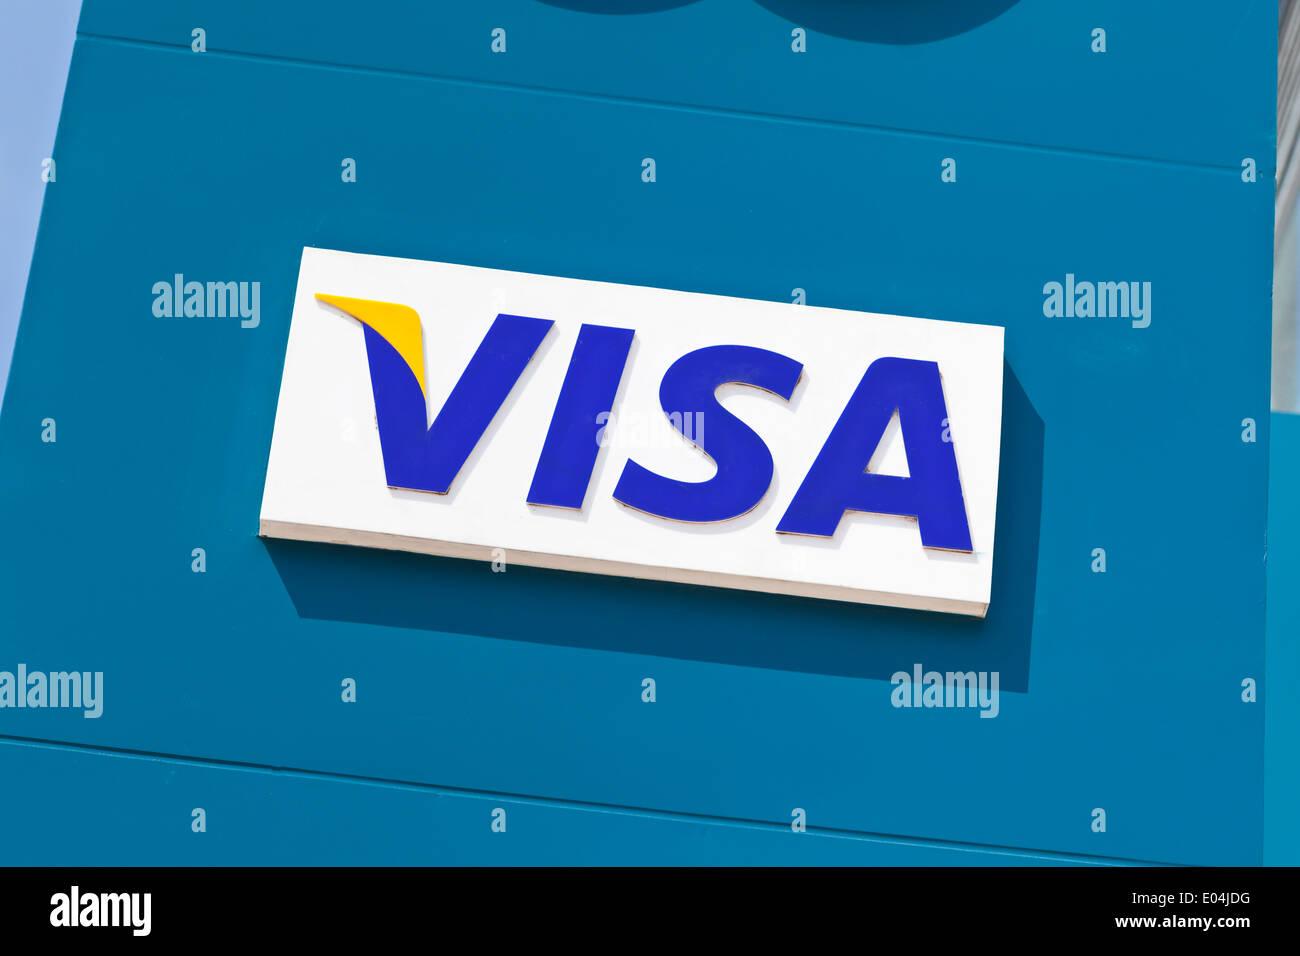 Visa sign - Stock Image